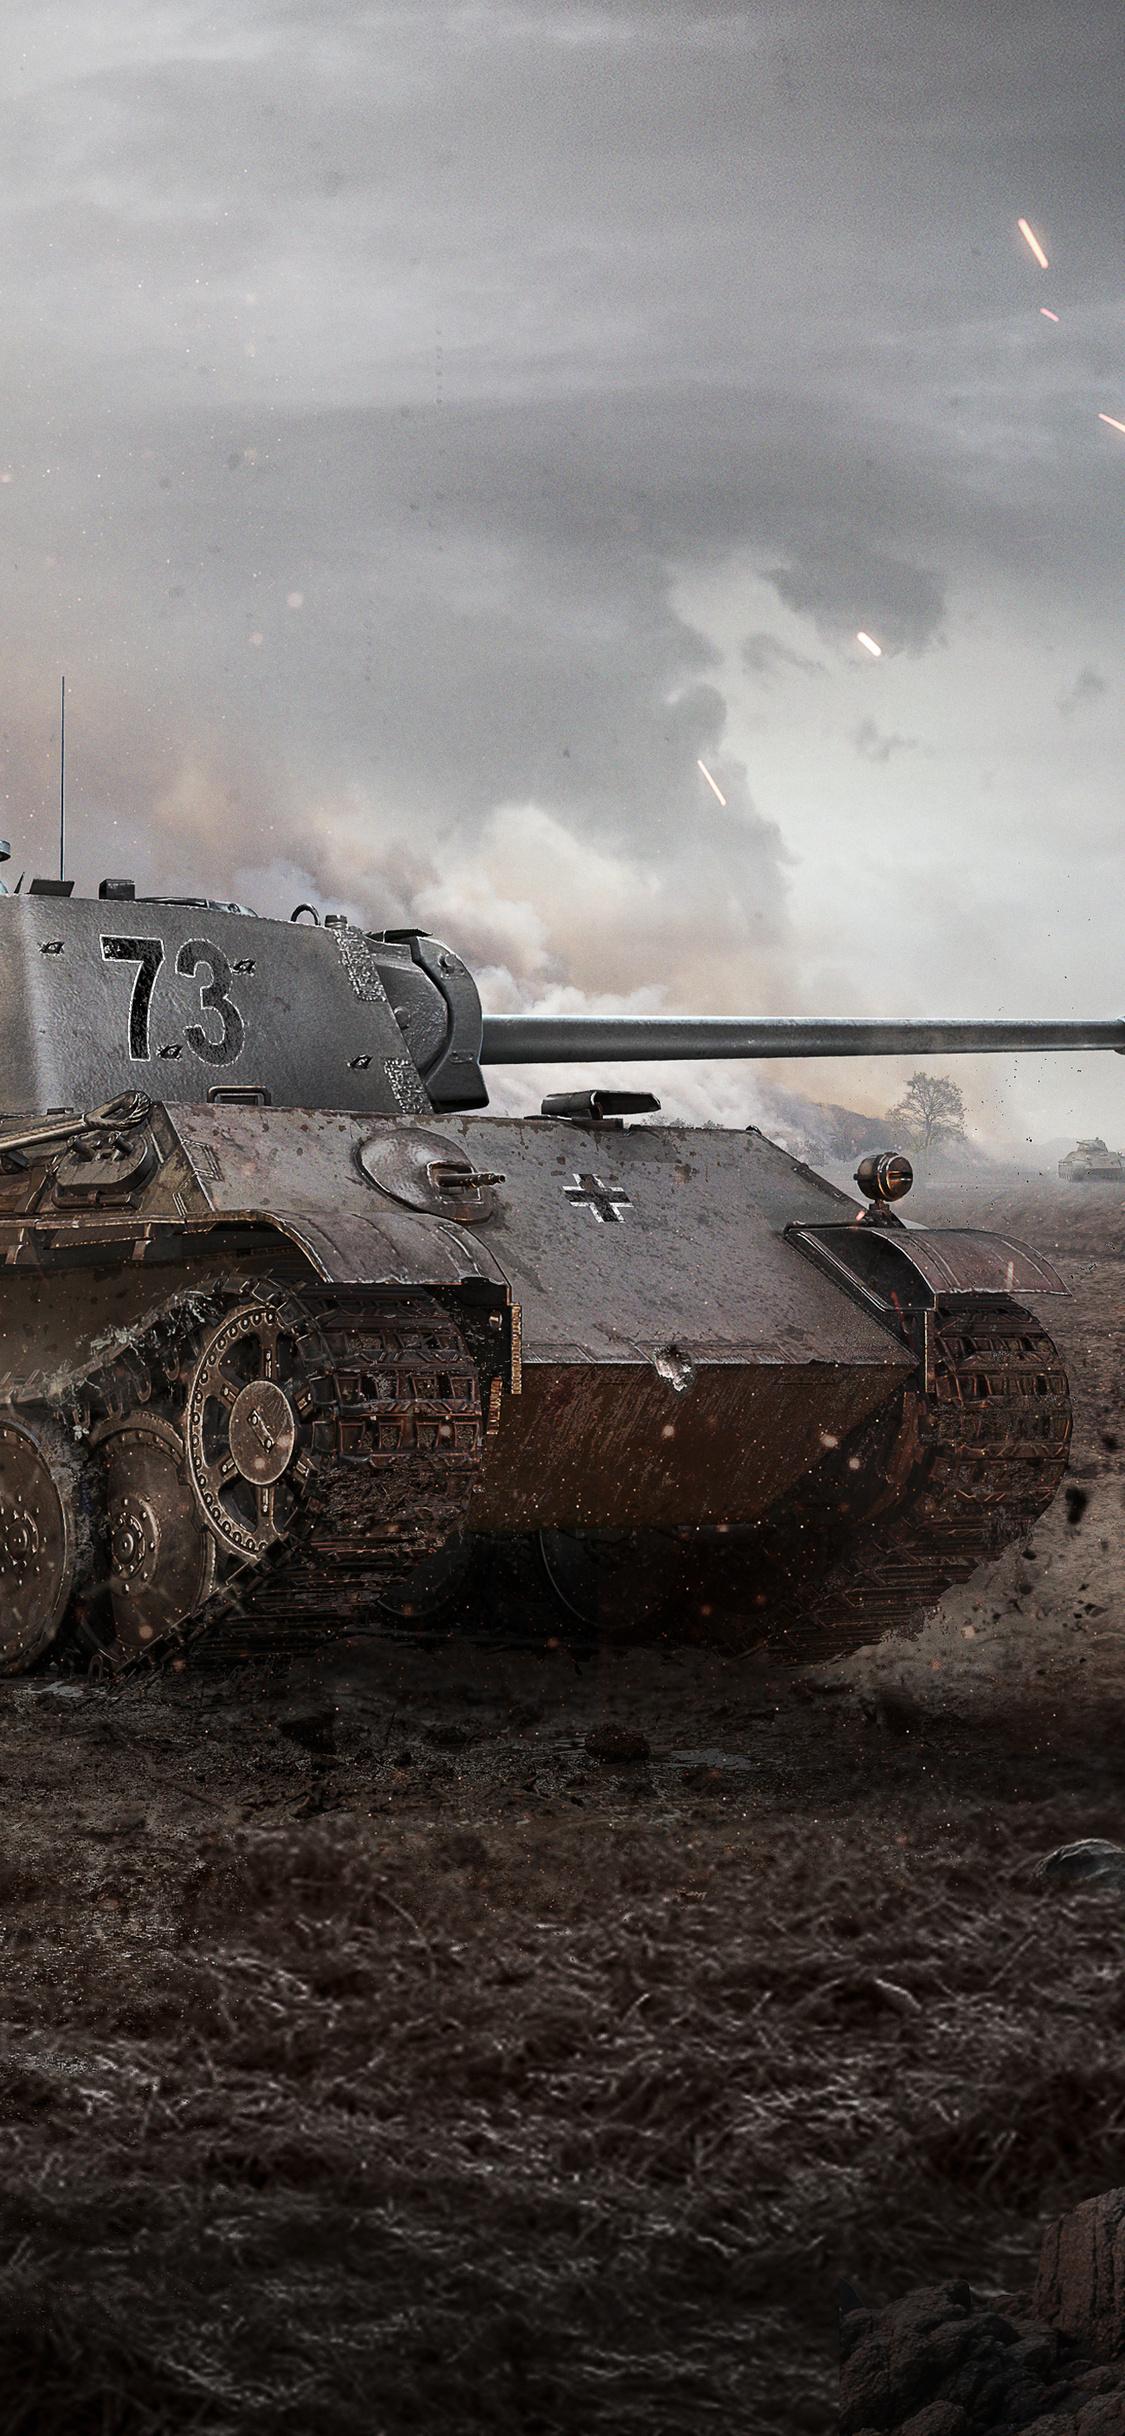 1125x2436 5k World Of Tanks Iphone Xs Iphone 10 Iphone X Hd